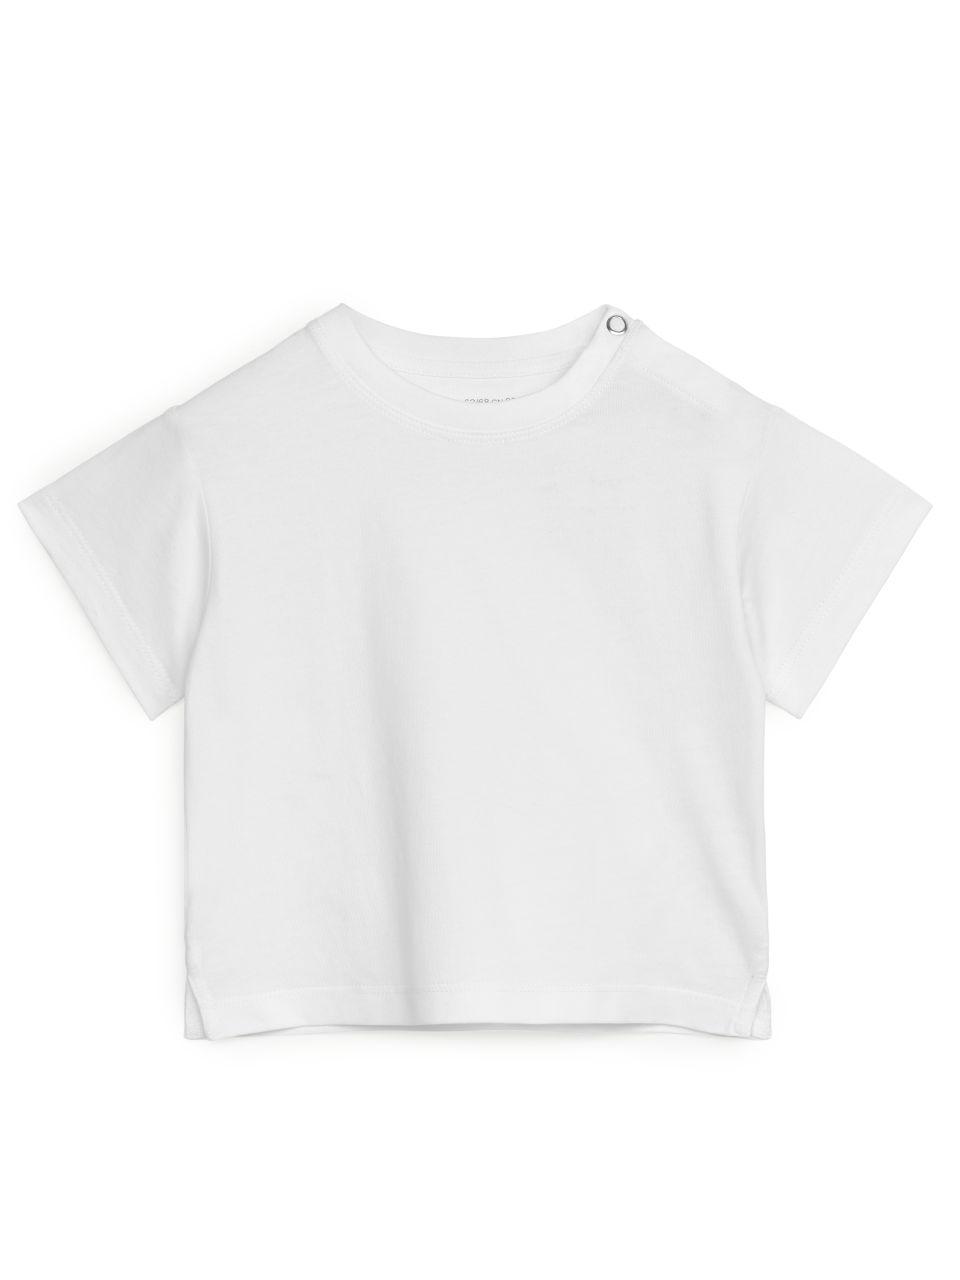 Short Sleeve T-Shirt - White